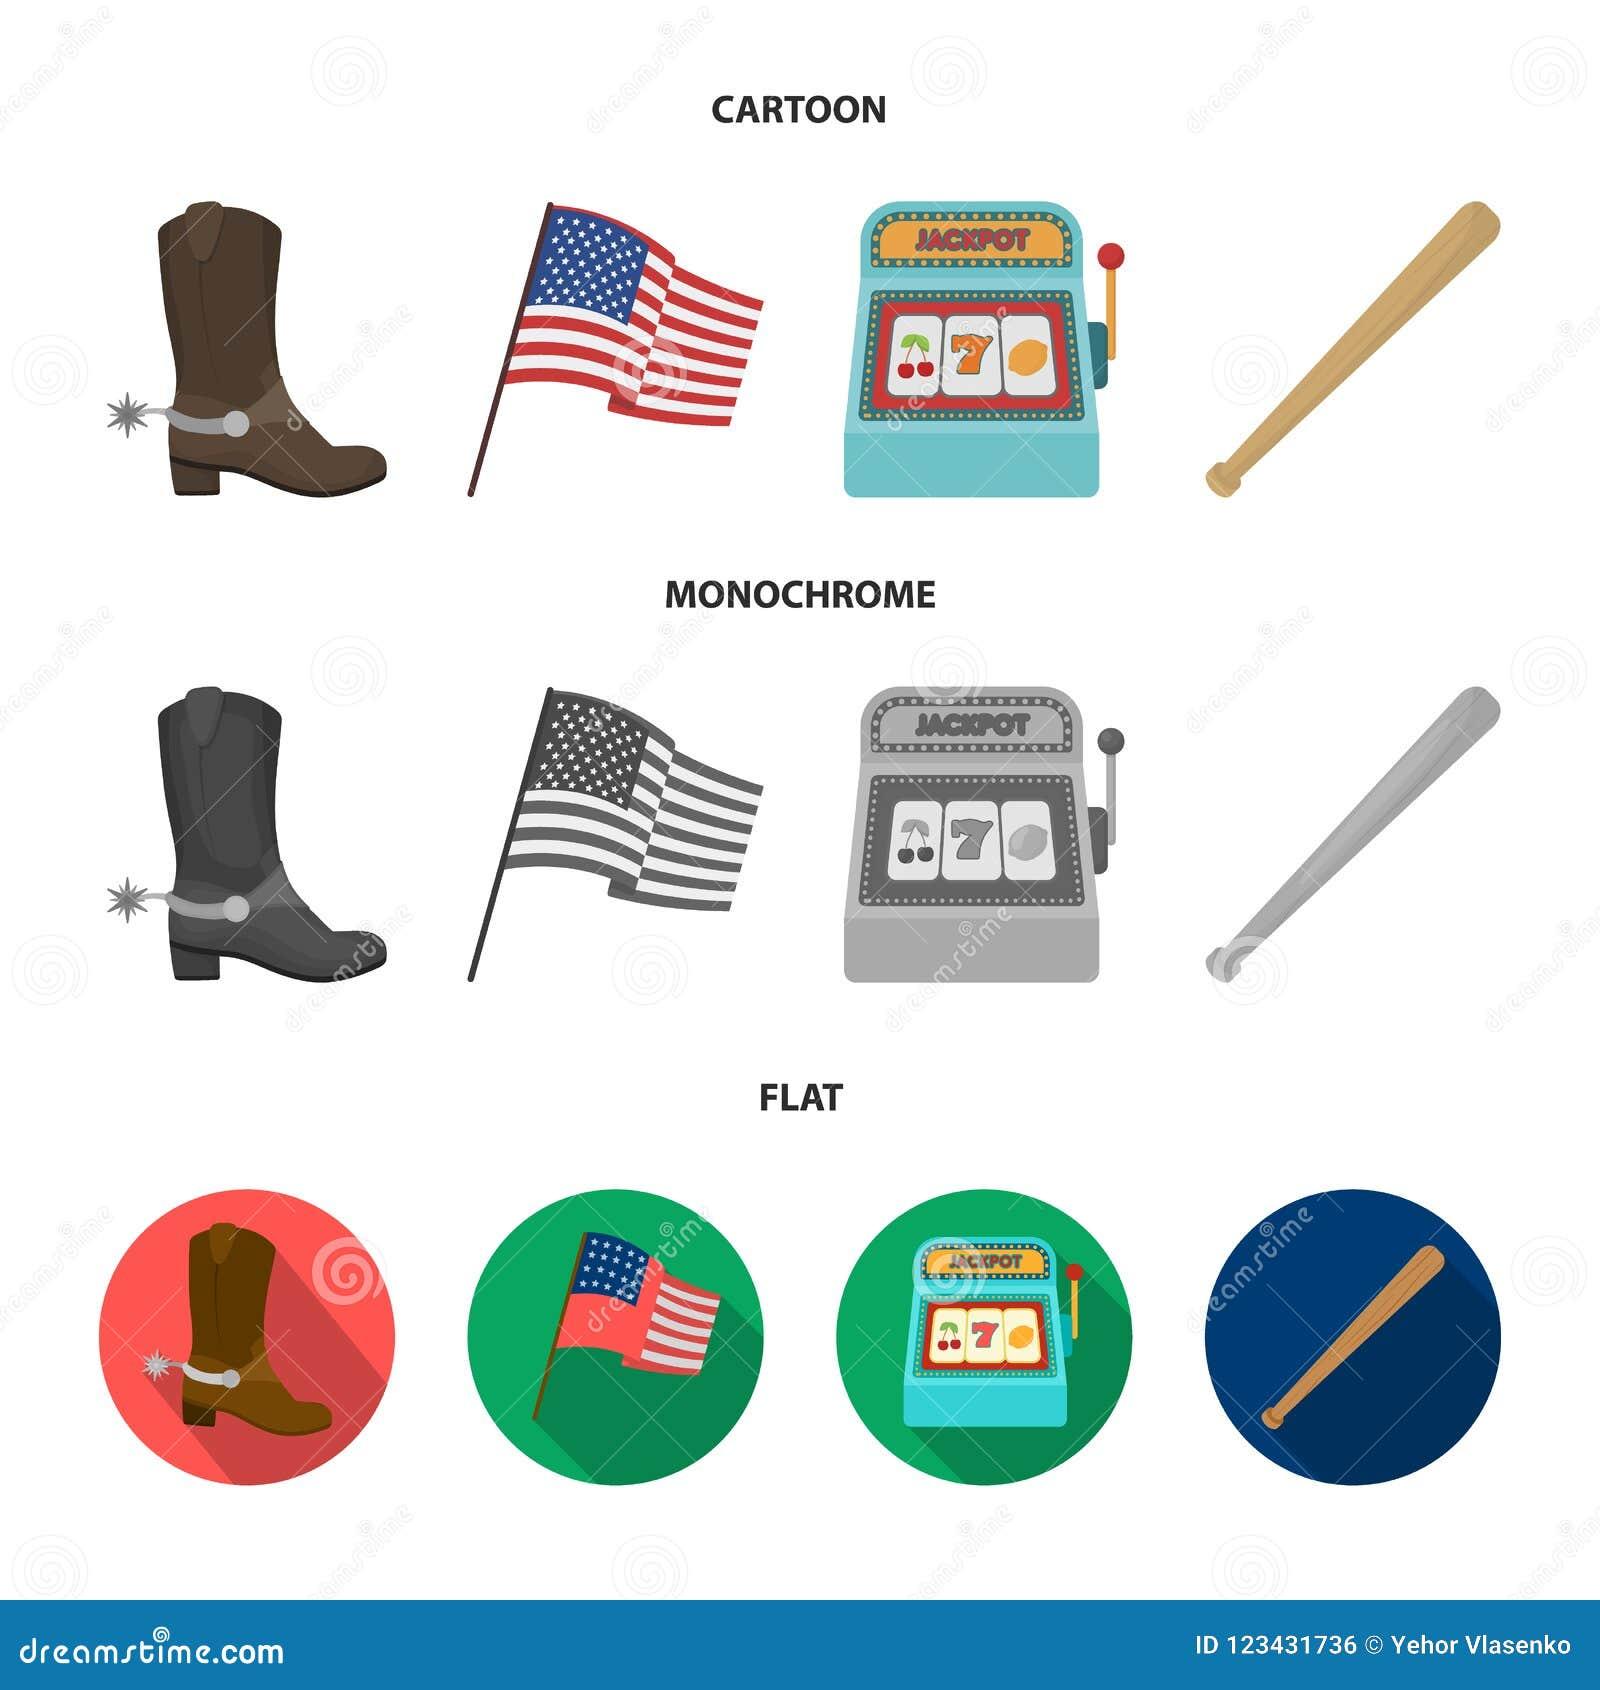 c3b605c21ad Cowboy Boots, National Flag, Slot Machine, Baseball Bat. USA Country ...